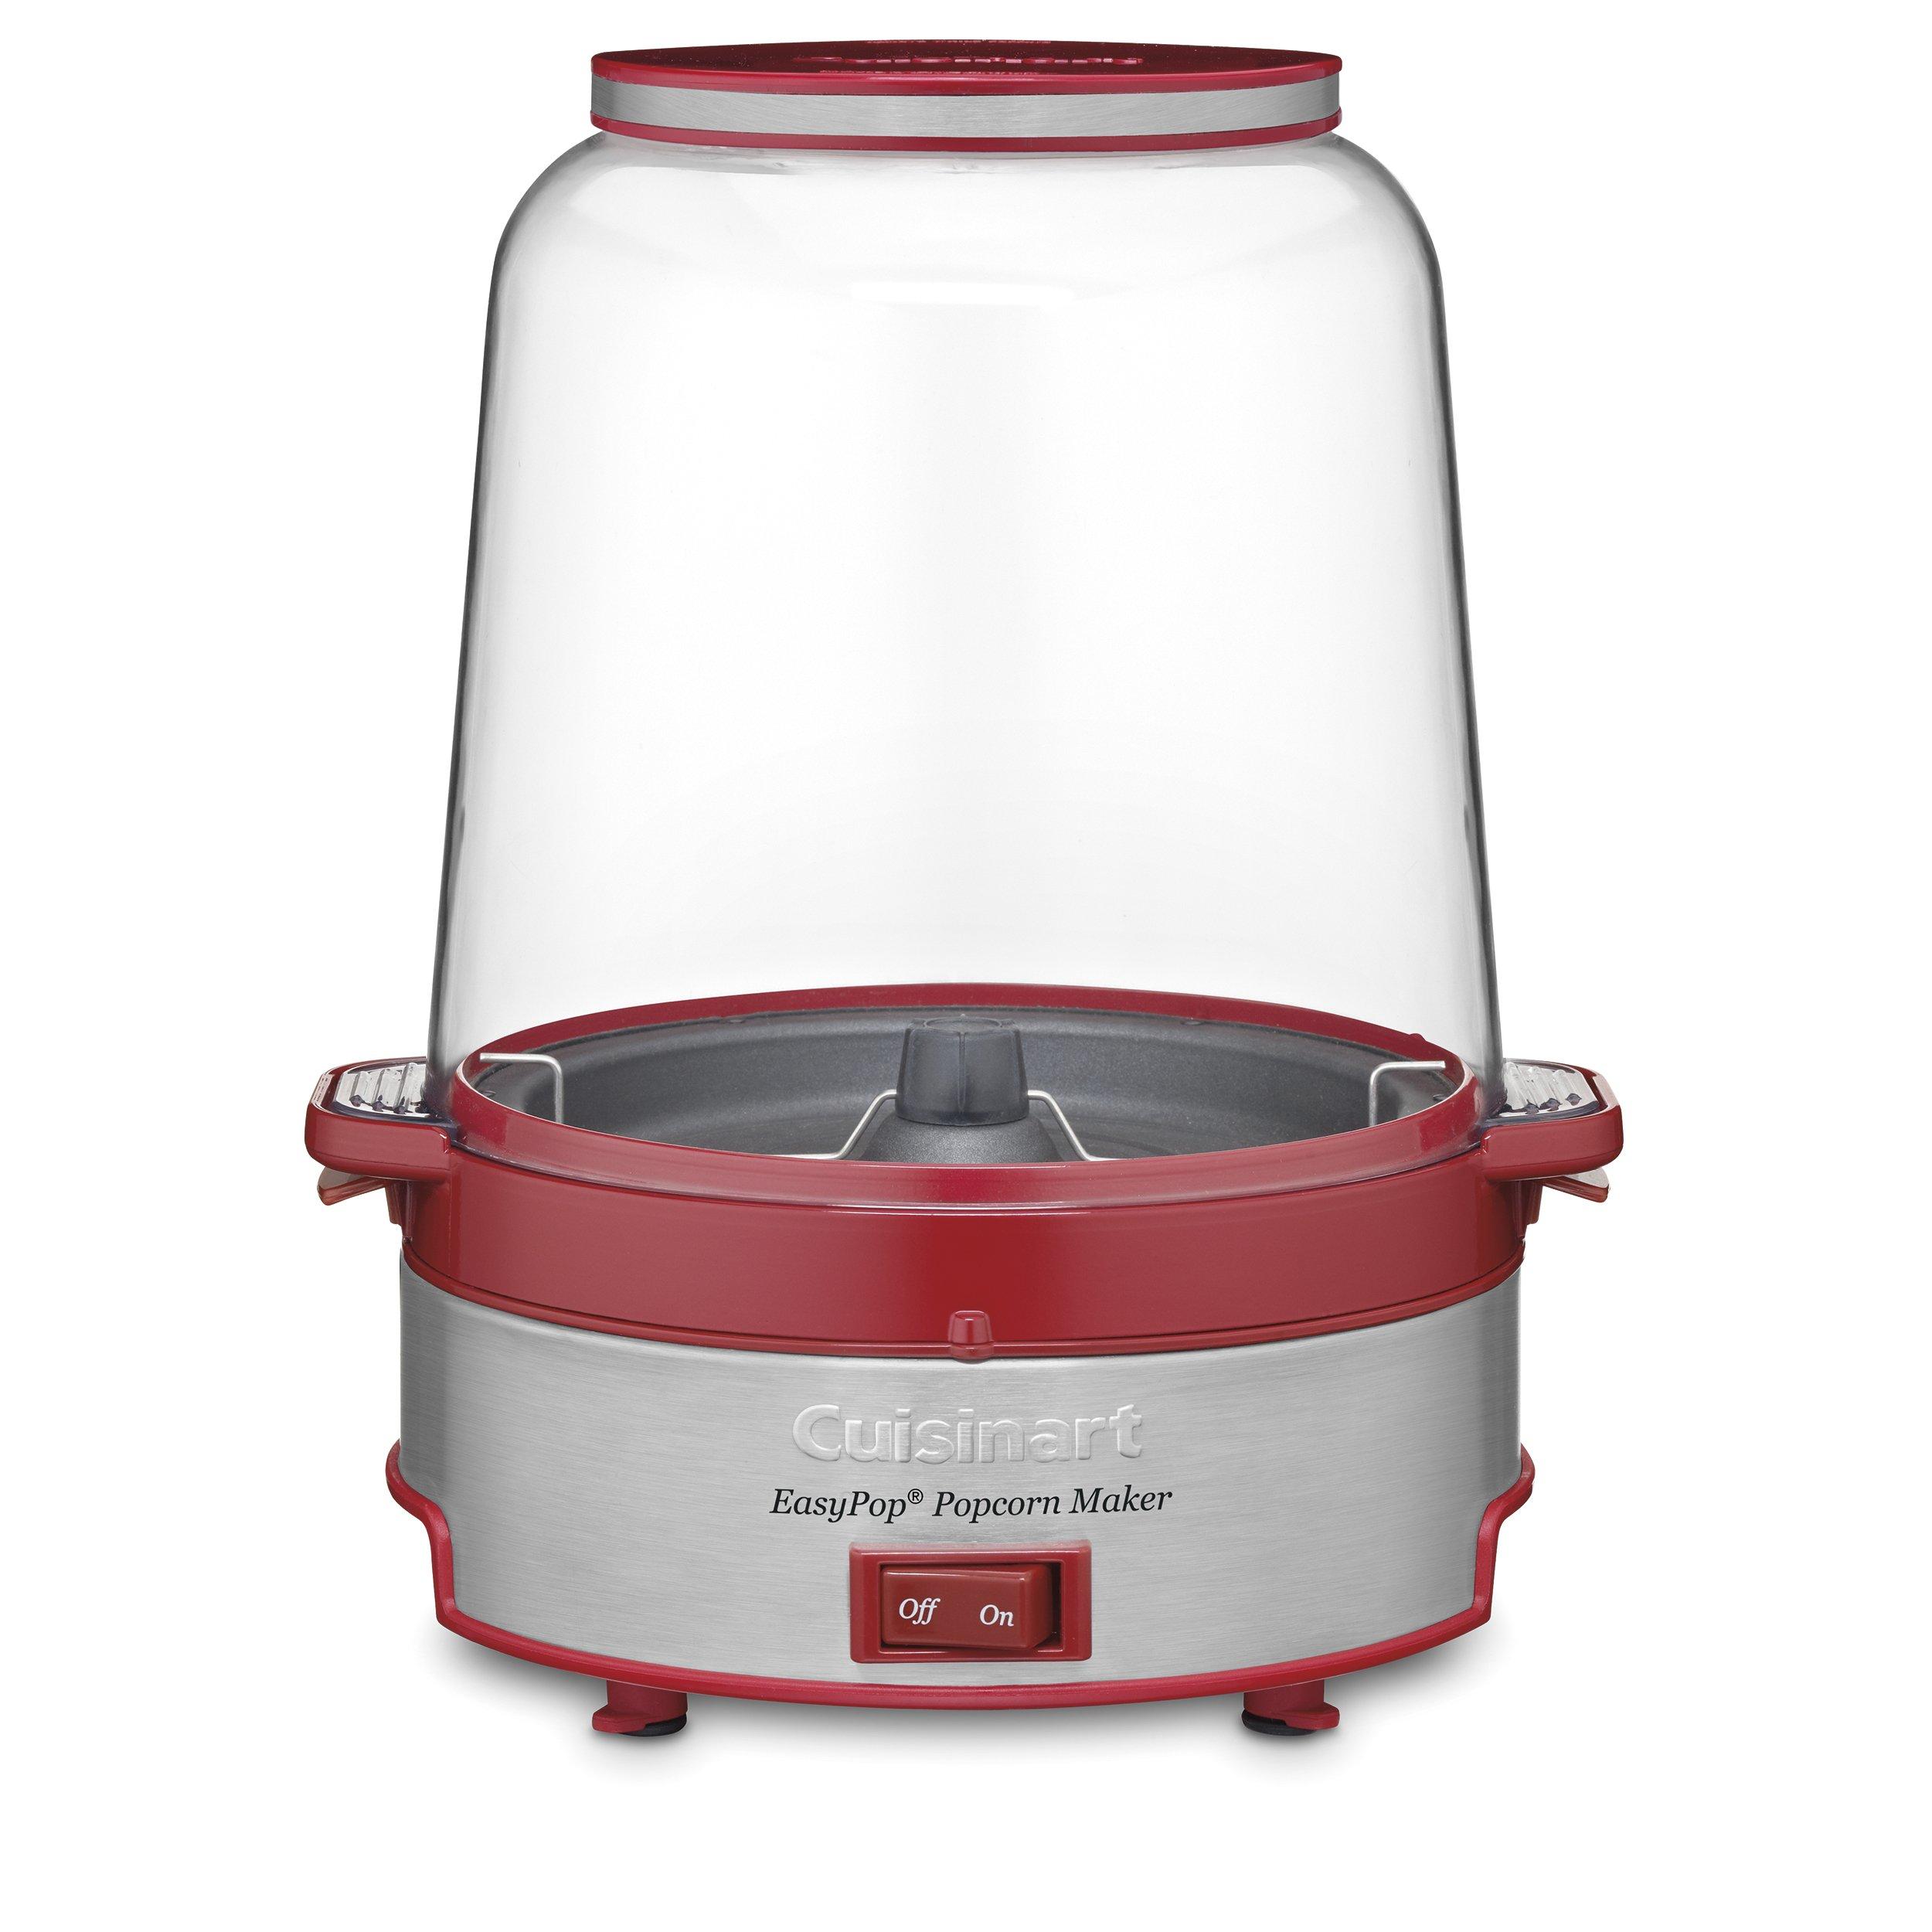 Cuisinart CPM-700FR Popcorn Maker (Certified Refurbished)